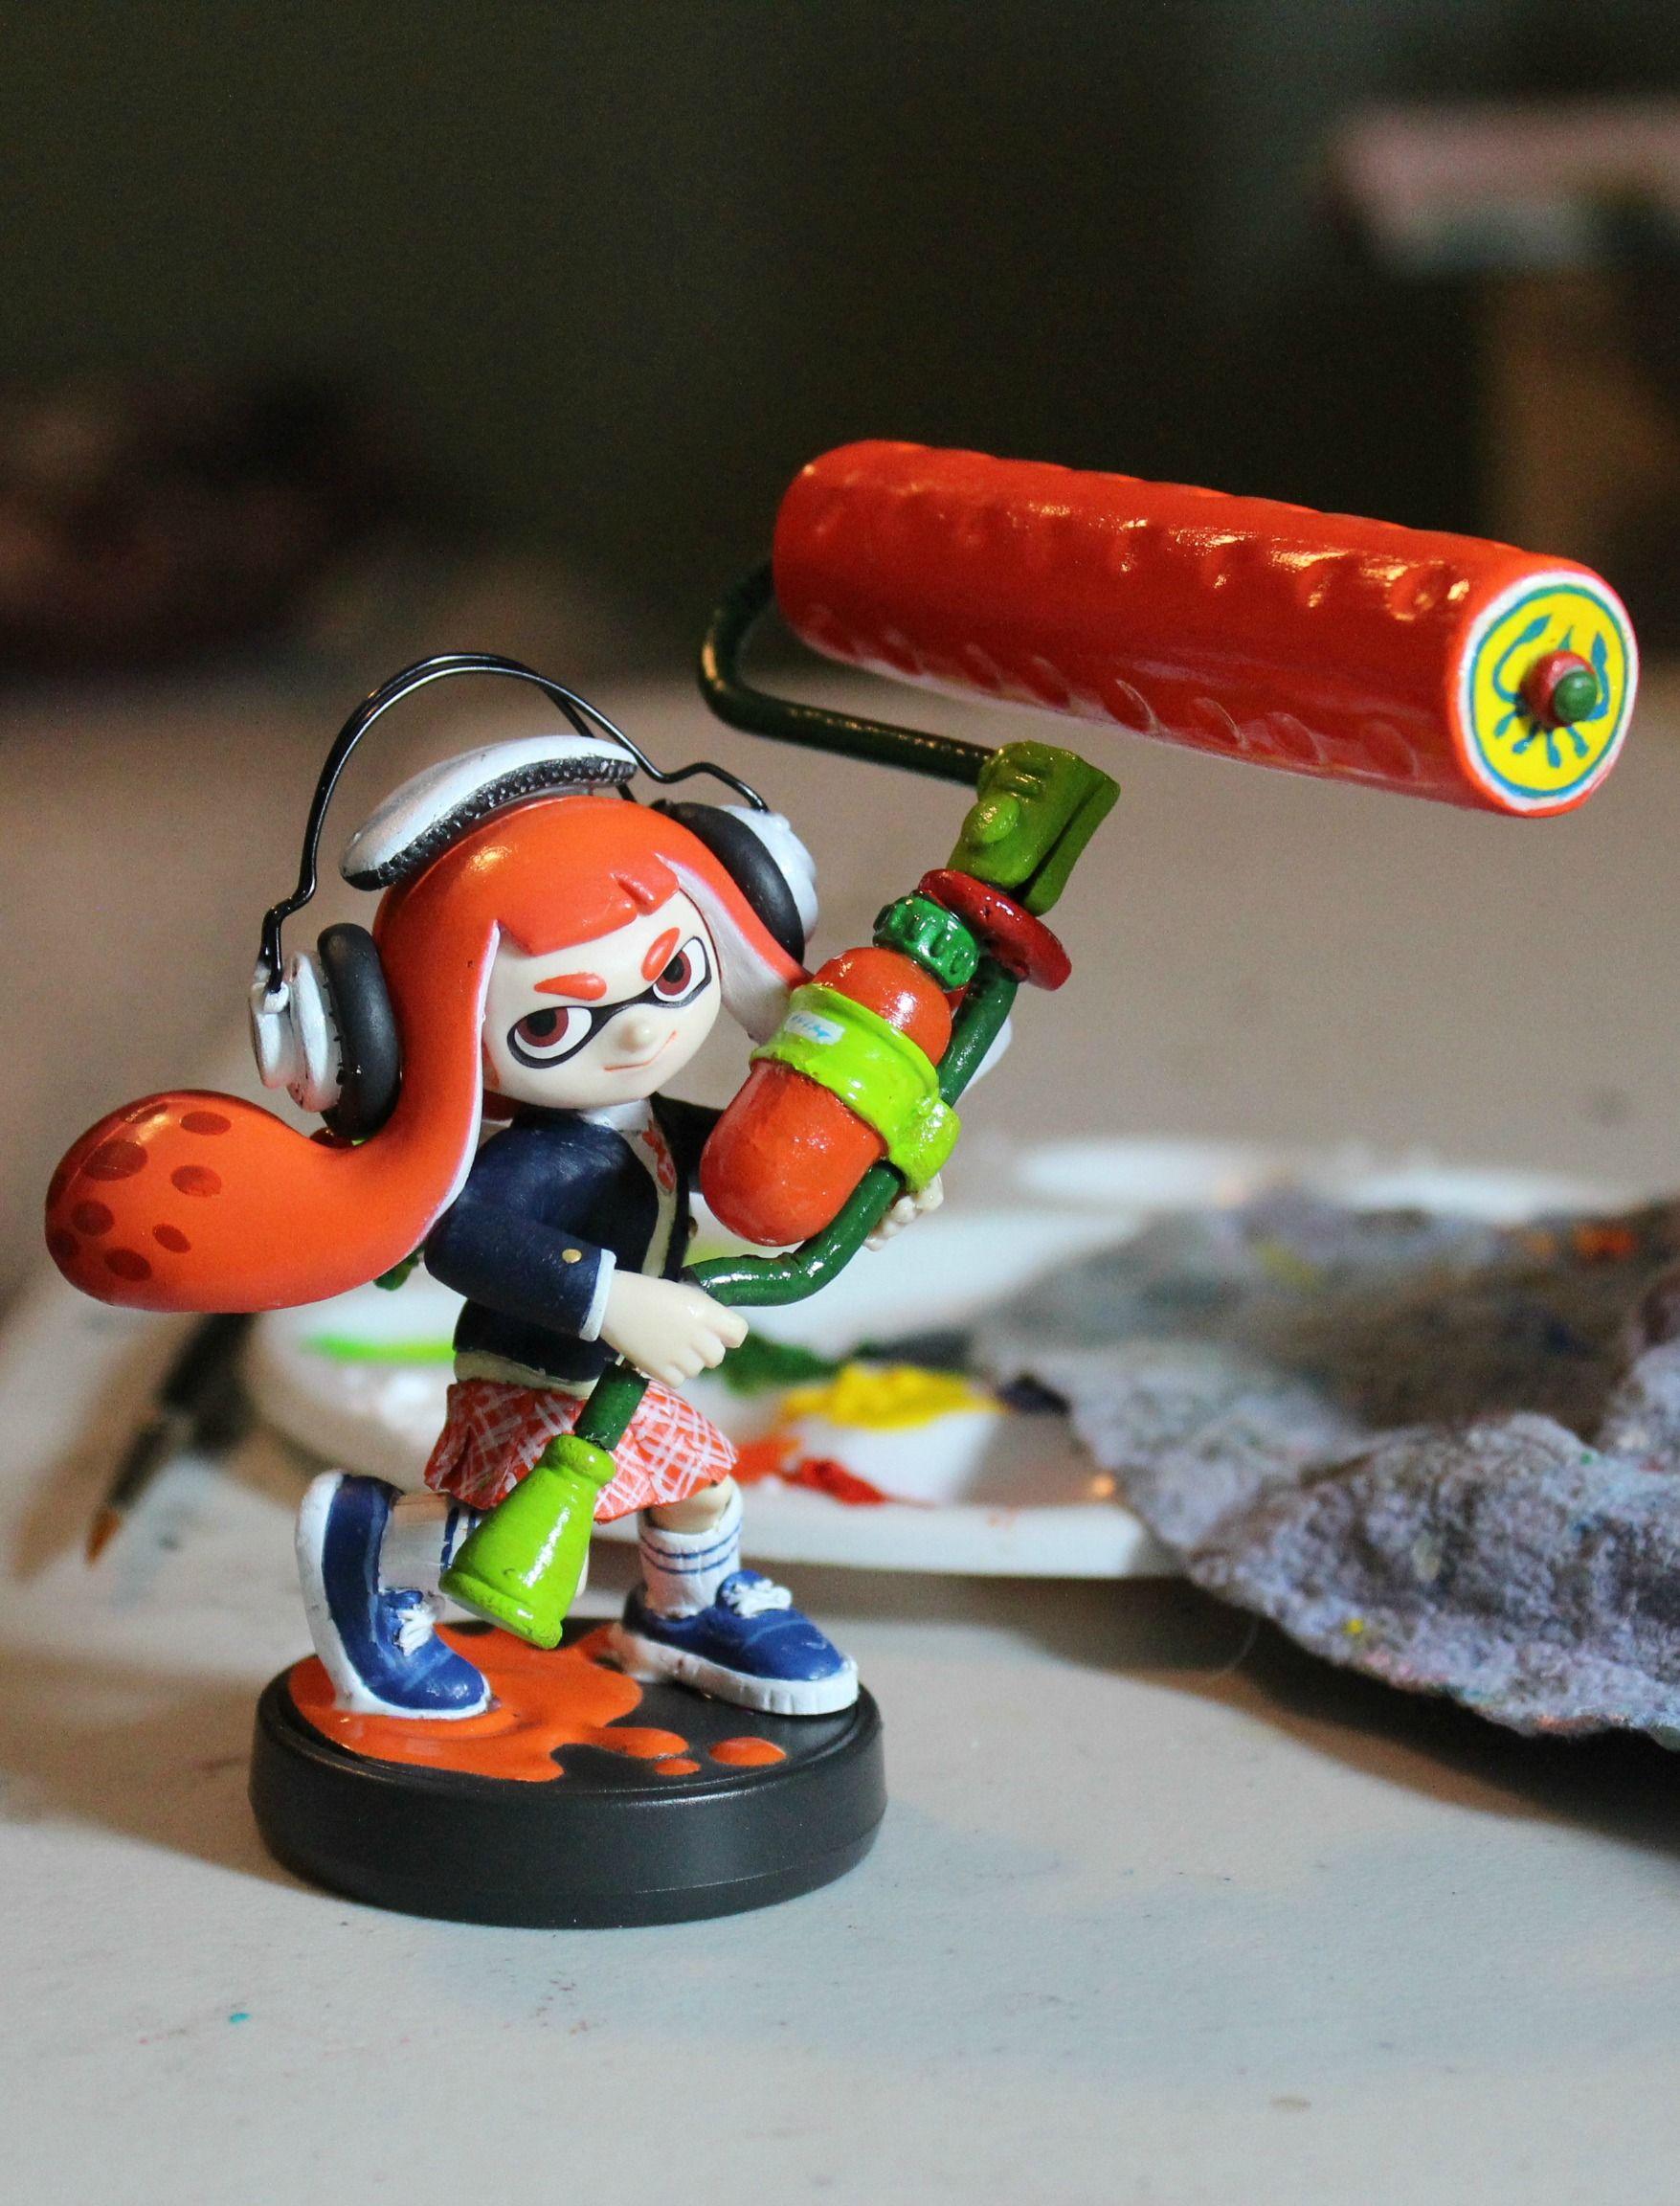 Custom Inkling Girl Splatoon Amiibo Complete Outfit Remodel Splatoon Amiibo Nintendo Fan Art